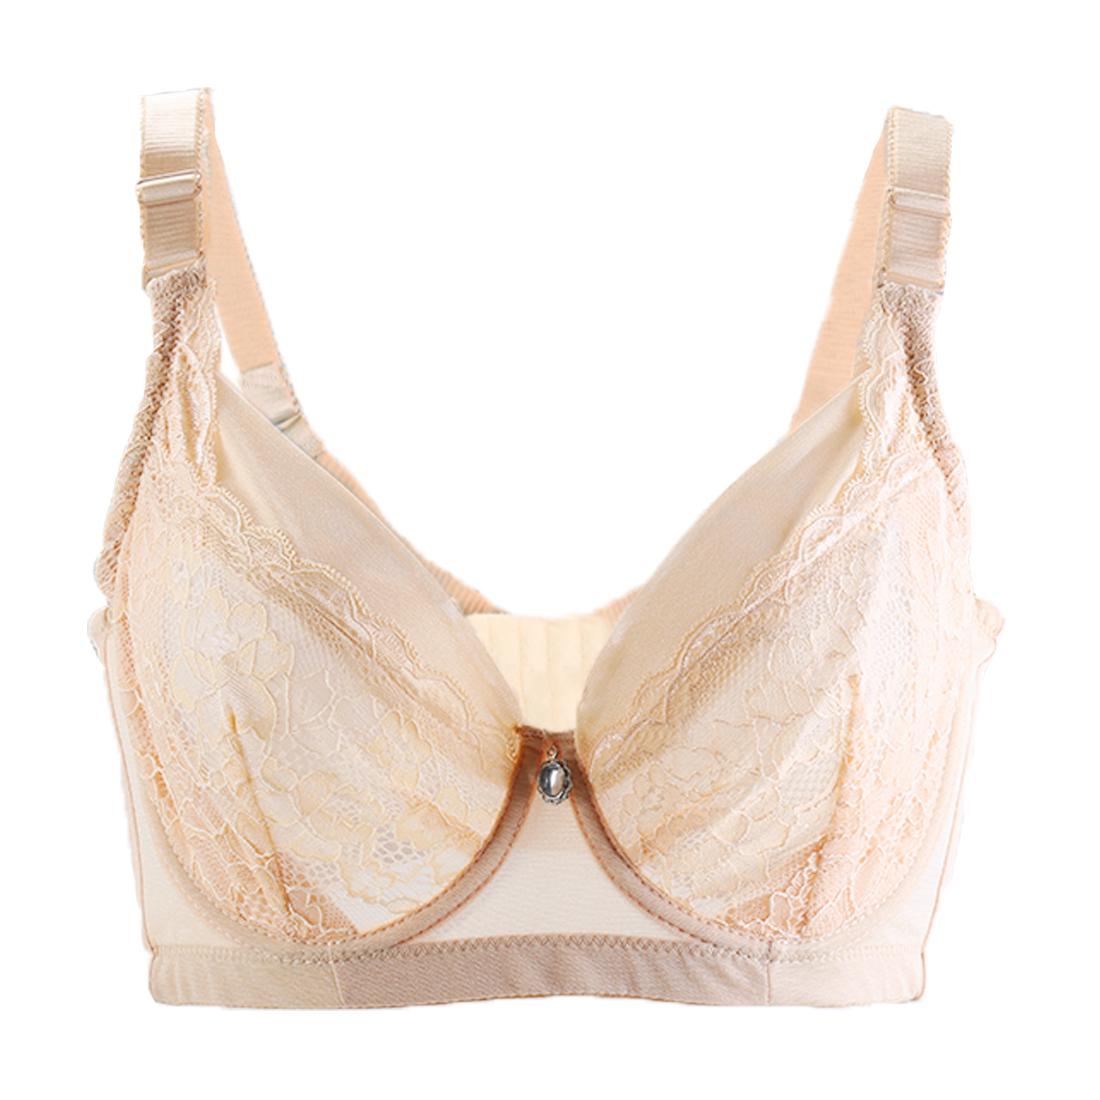 Women Semitransparent Push Up Lace Deco Thin Cup Underwire Bra Beige 42/95